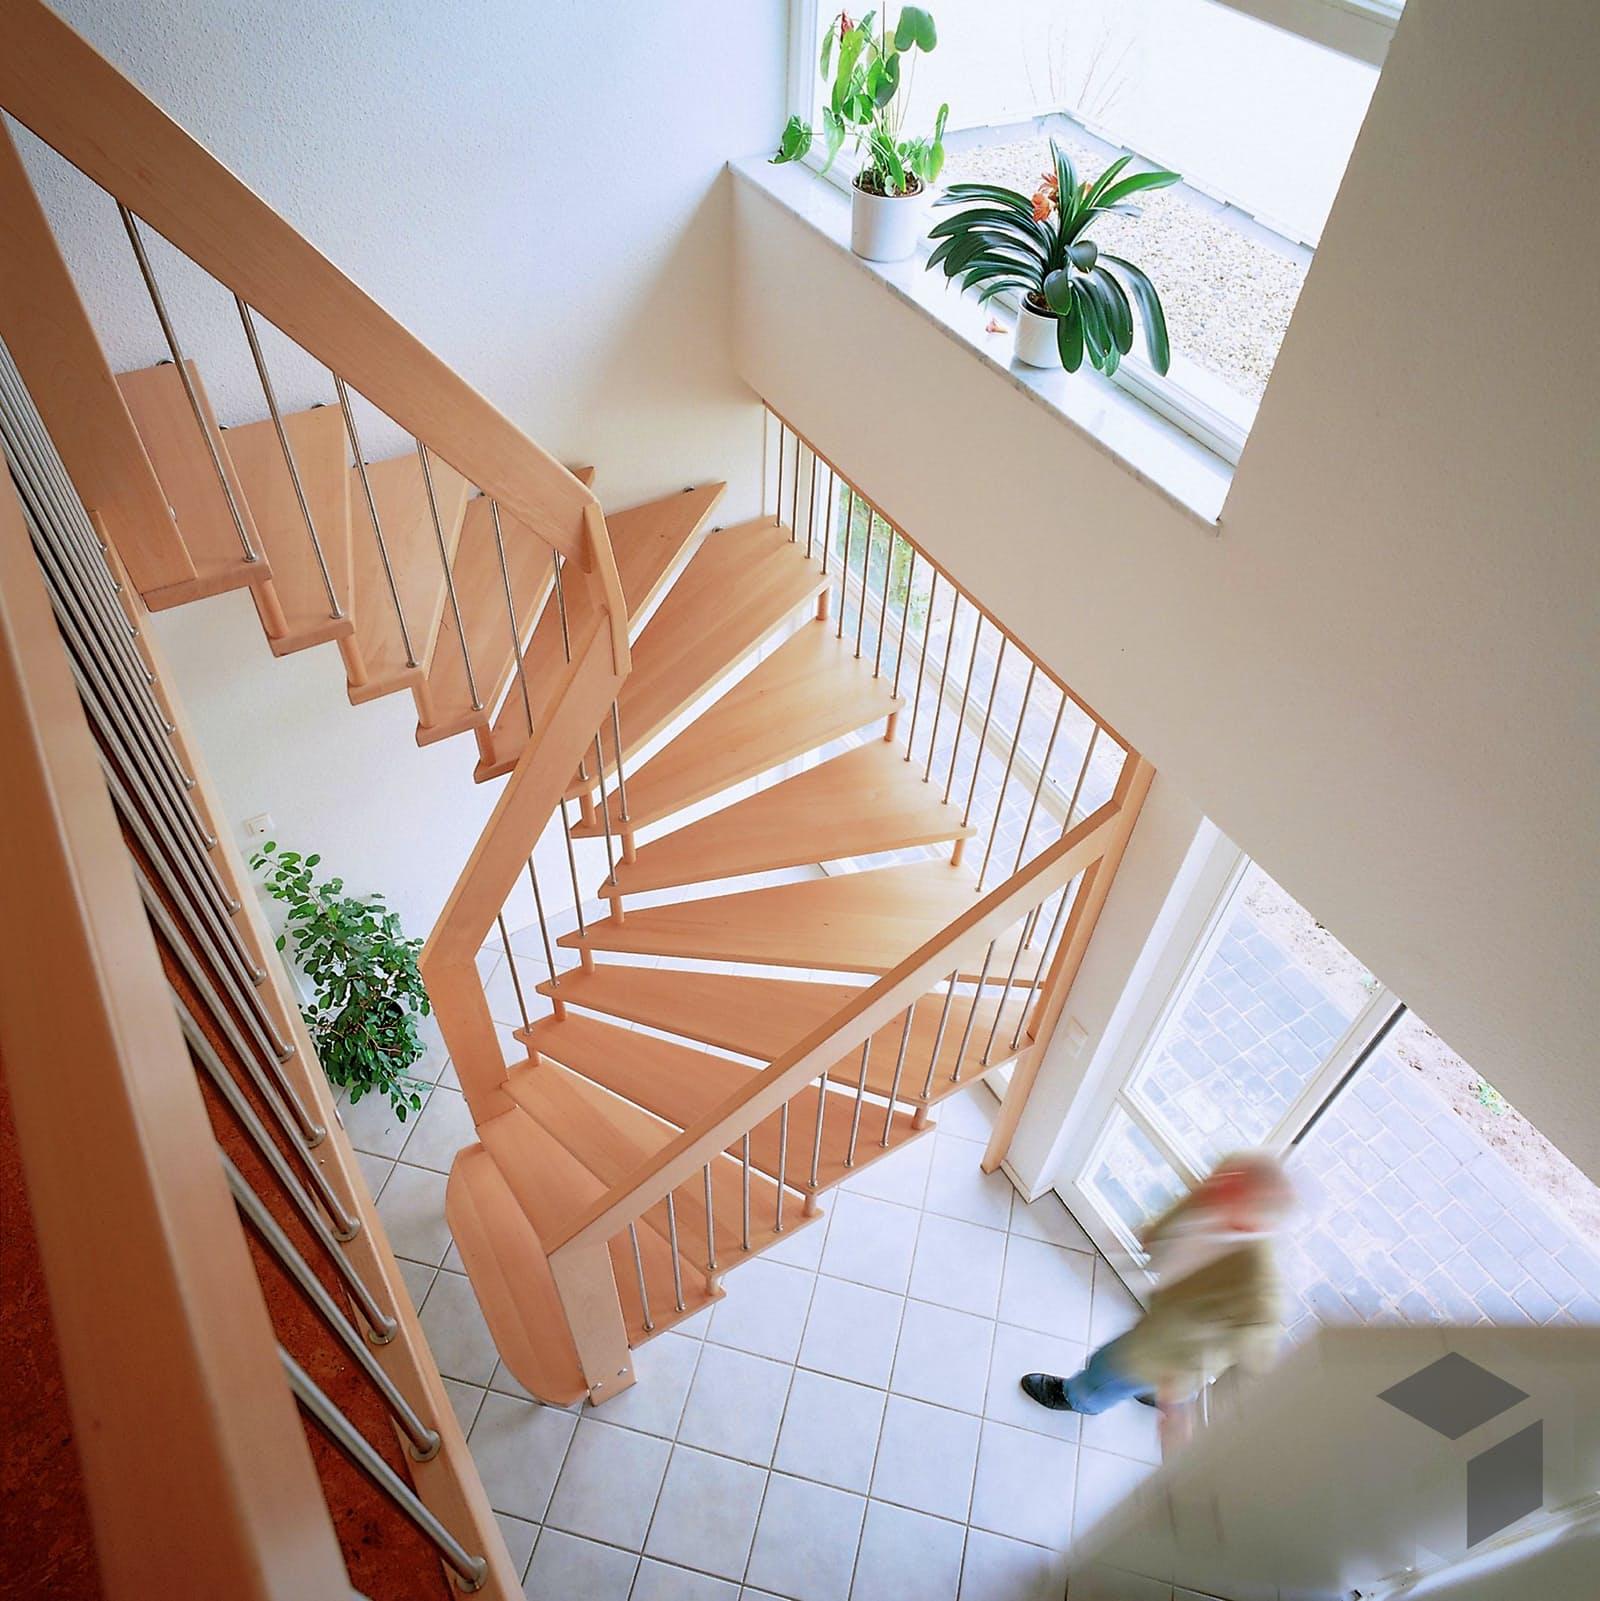 stadthaus s 94 1 0 inactive von haacke haus komplette daten bersicht. Black Bedroom Furniture Sets. Home Design Ideas